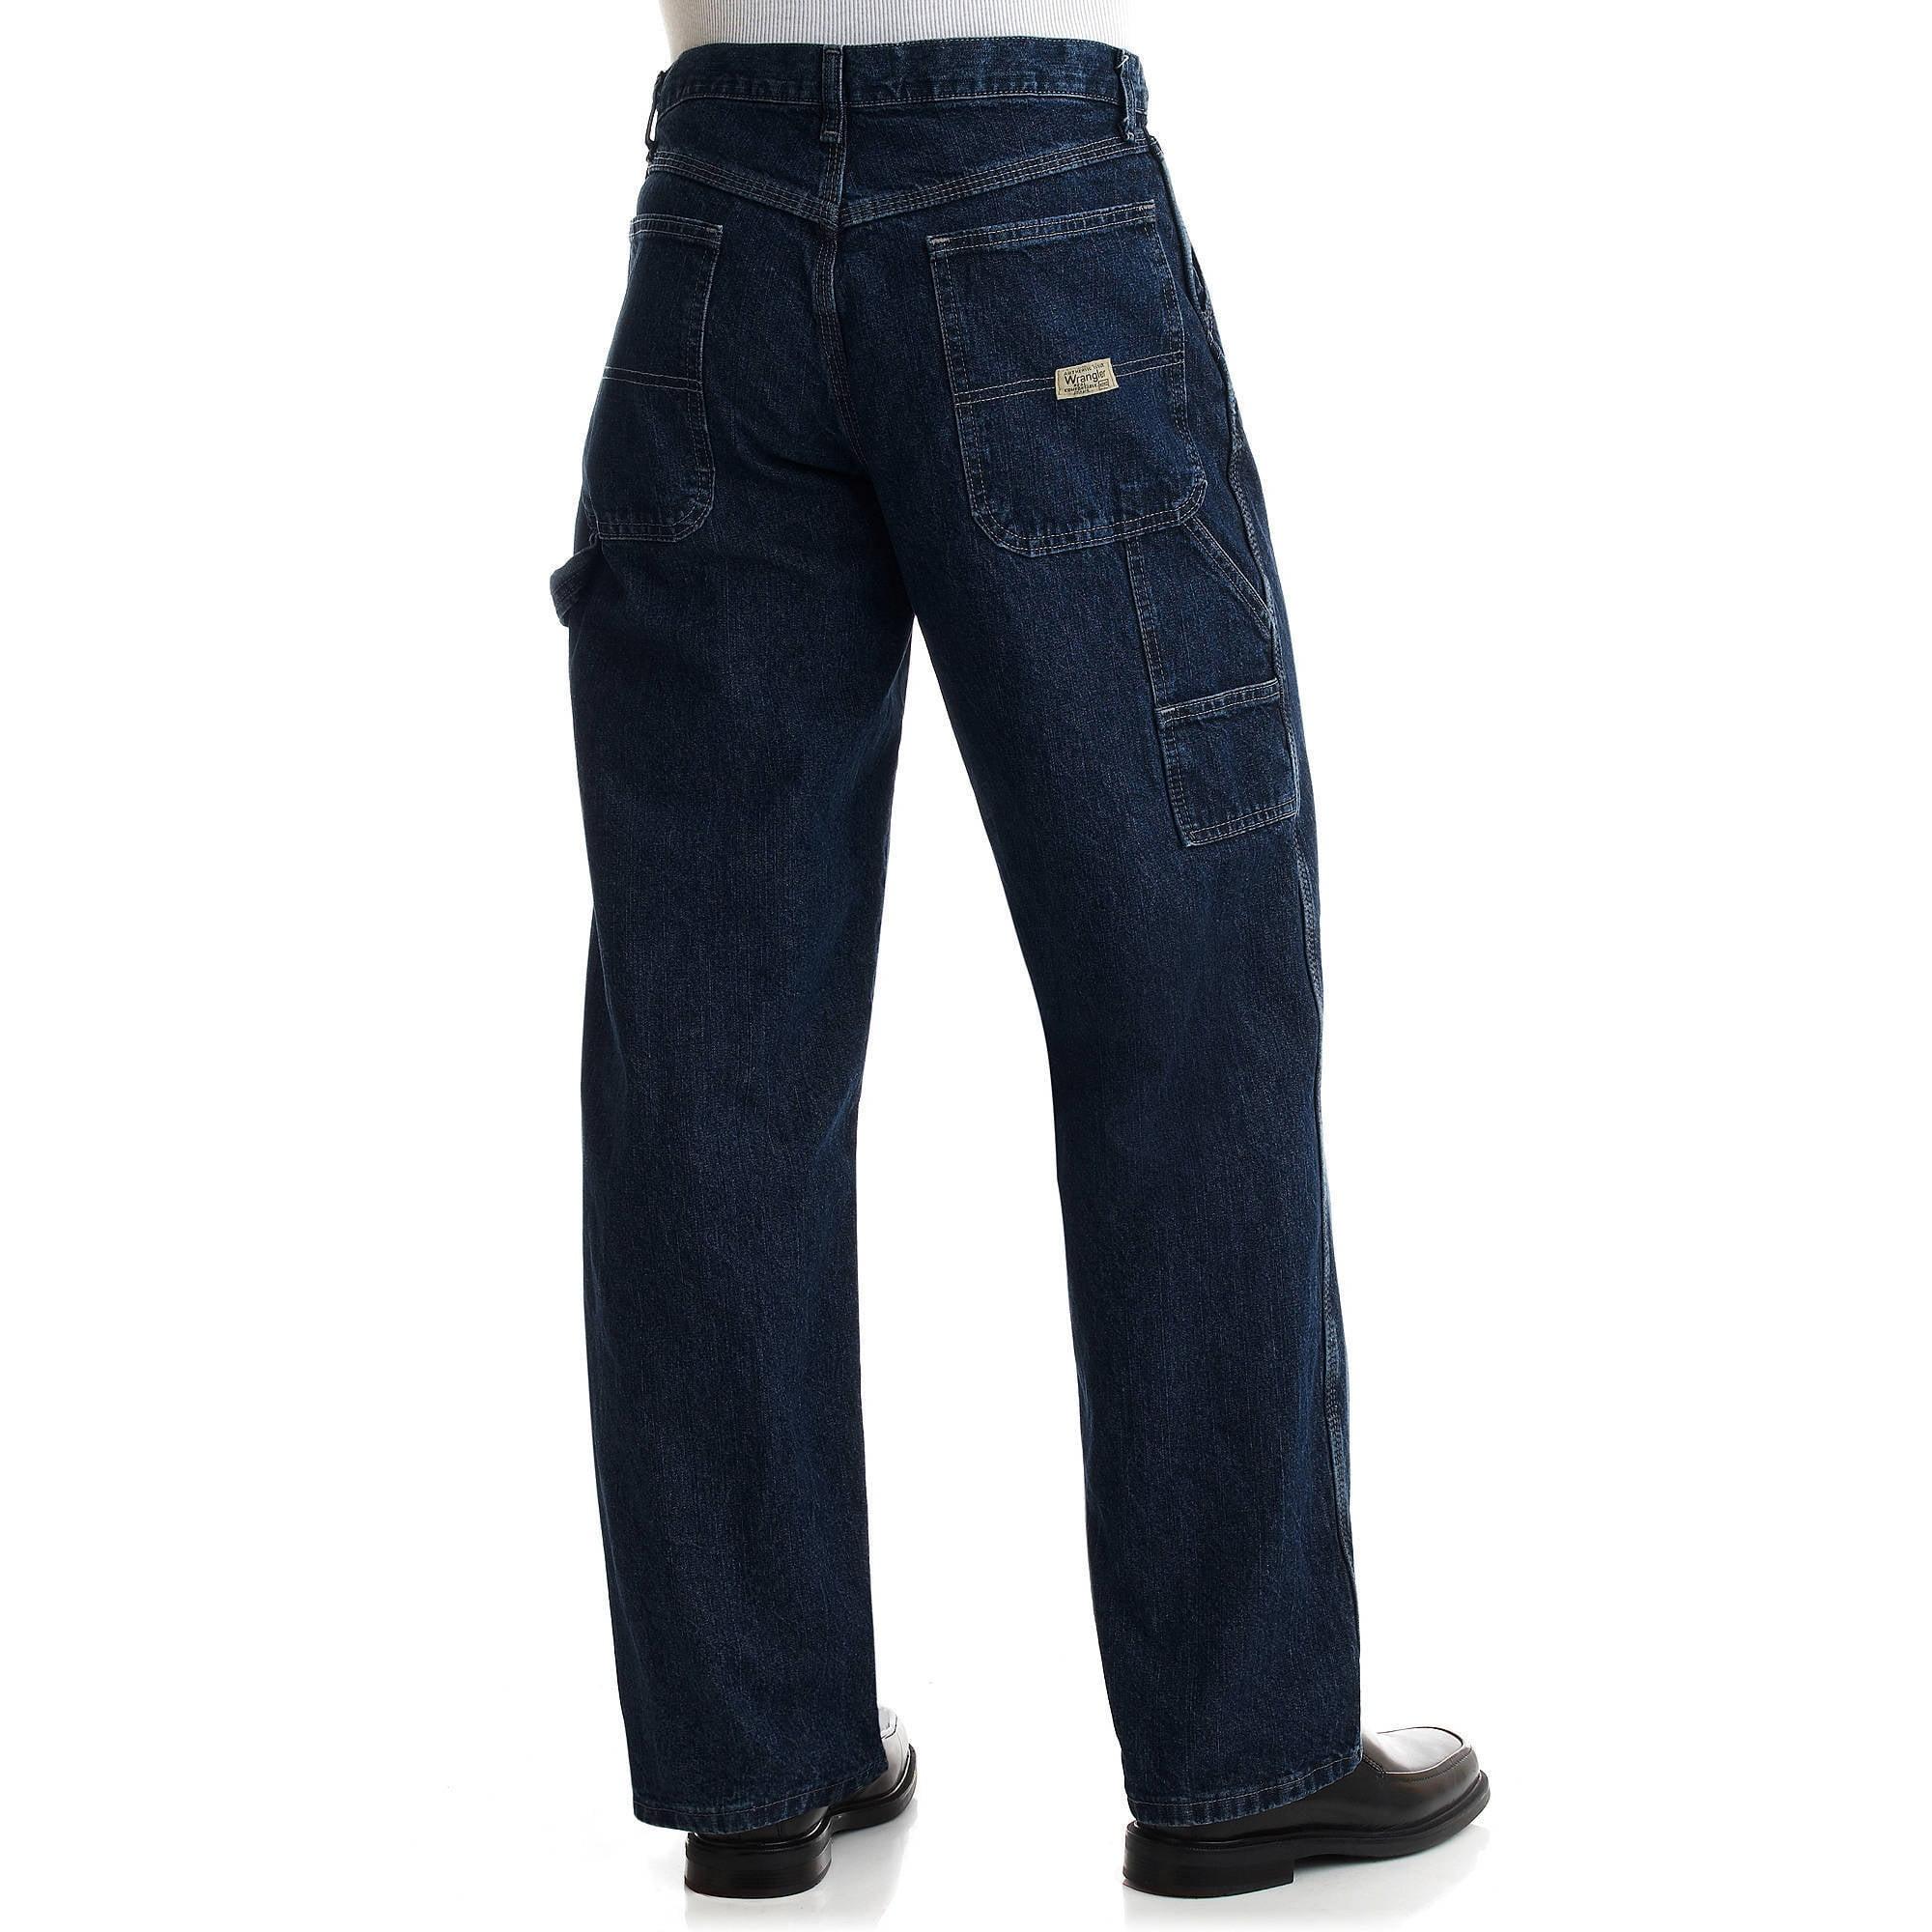 Wrangler Men's Carpenter Jeans - Walmart.com